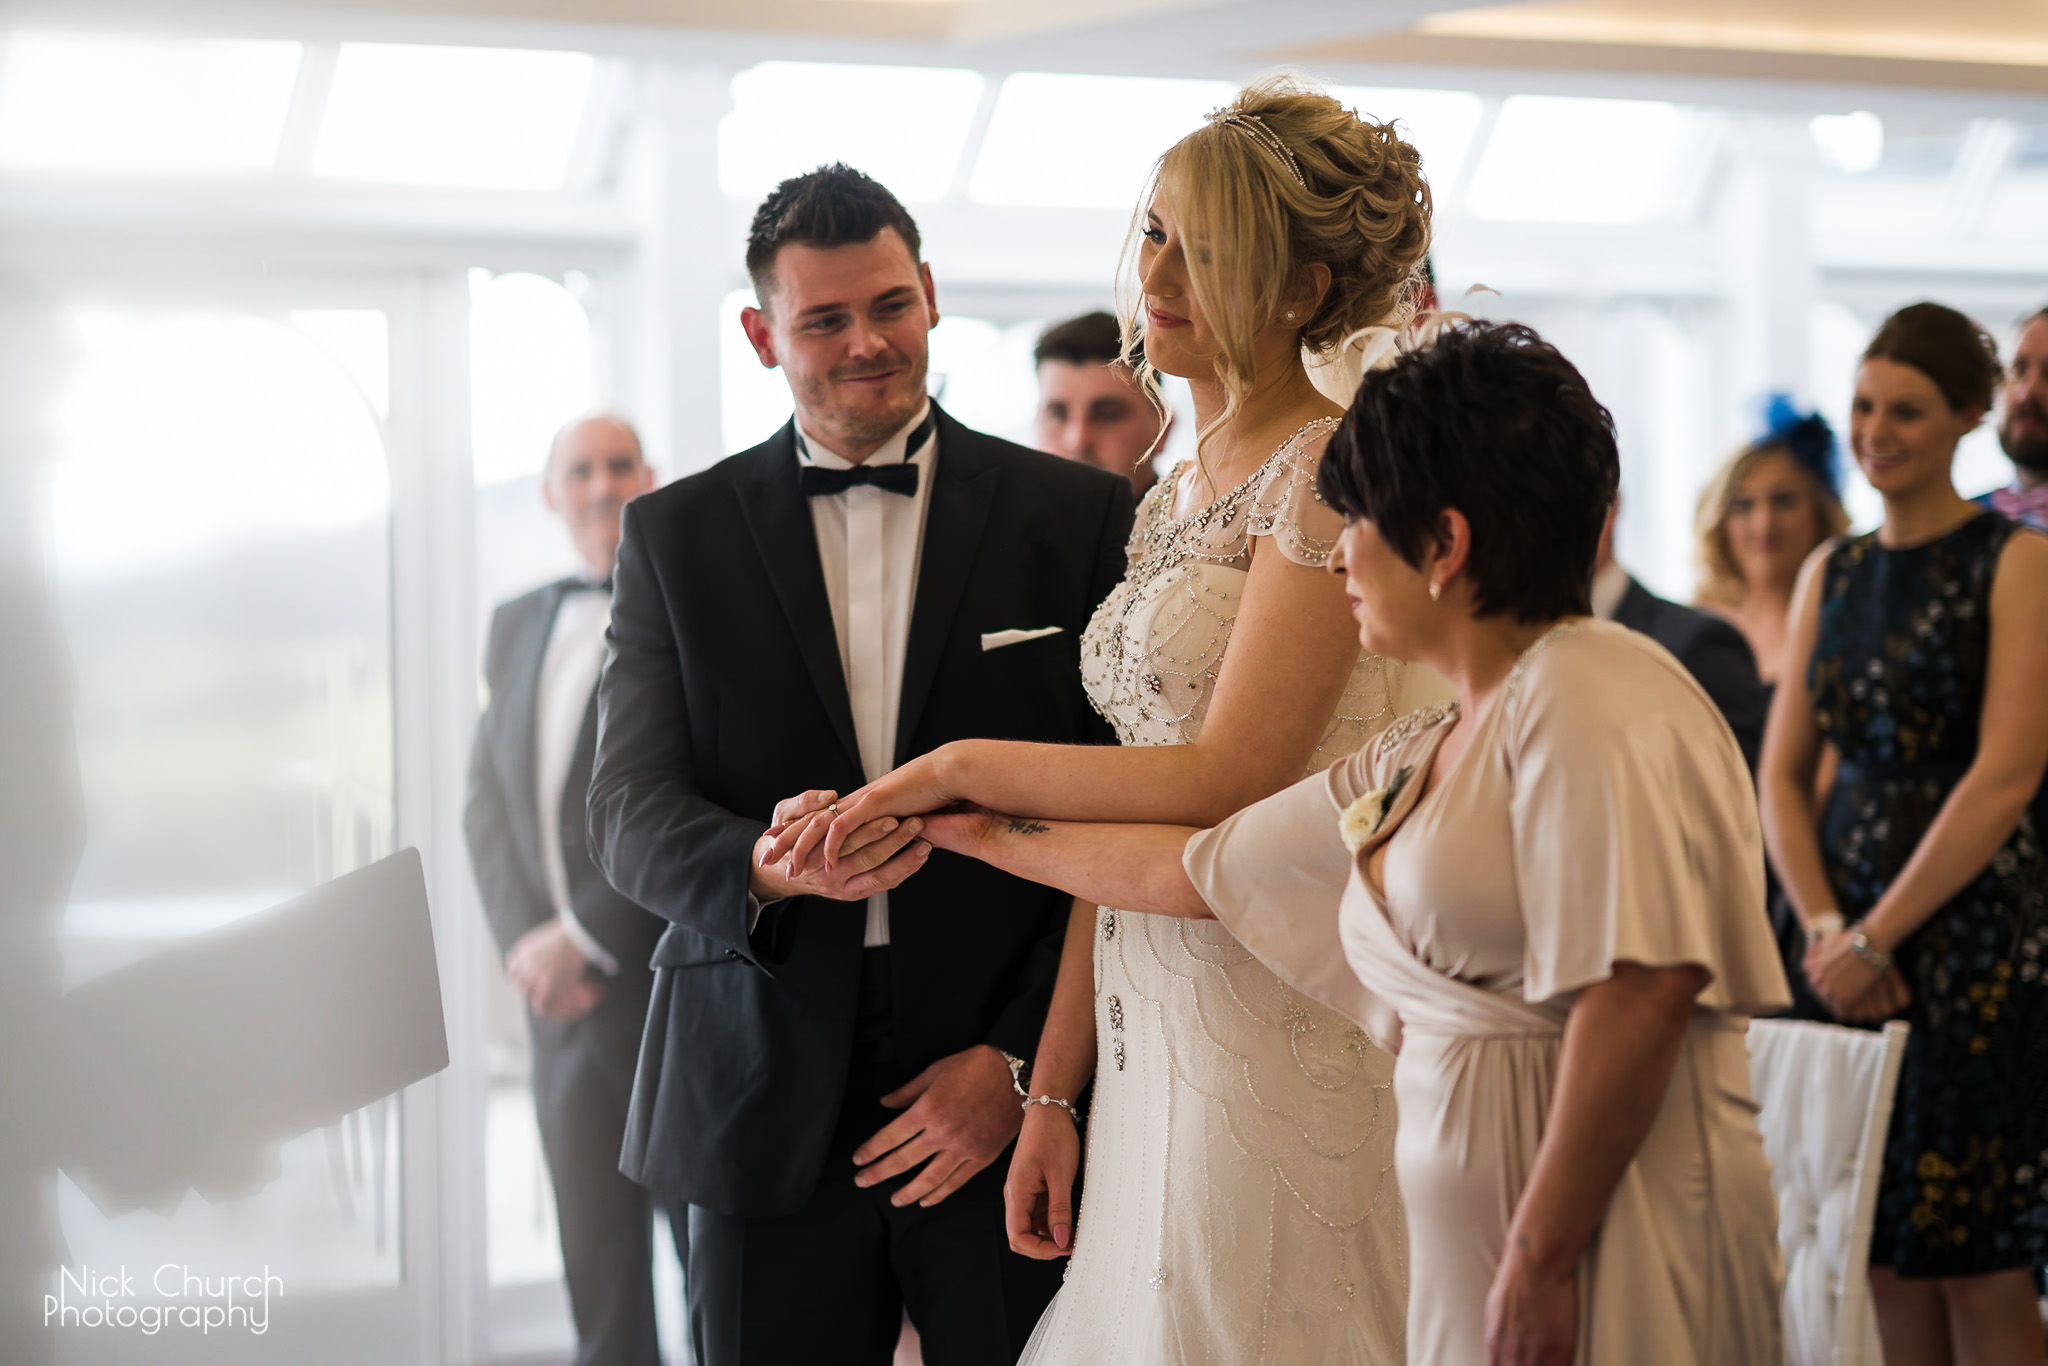 NC-20180317-stacy-and-mike-wedding-0521.jpg